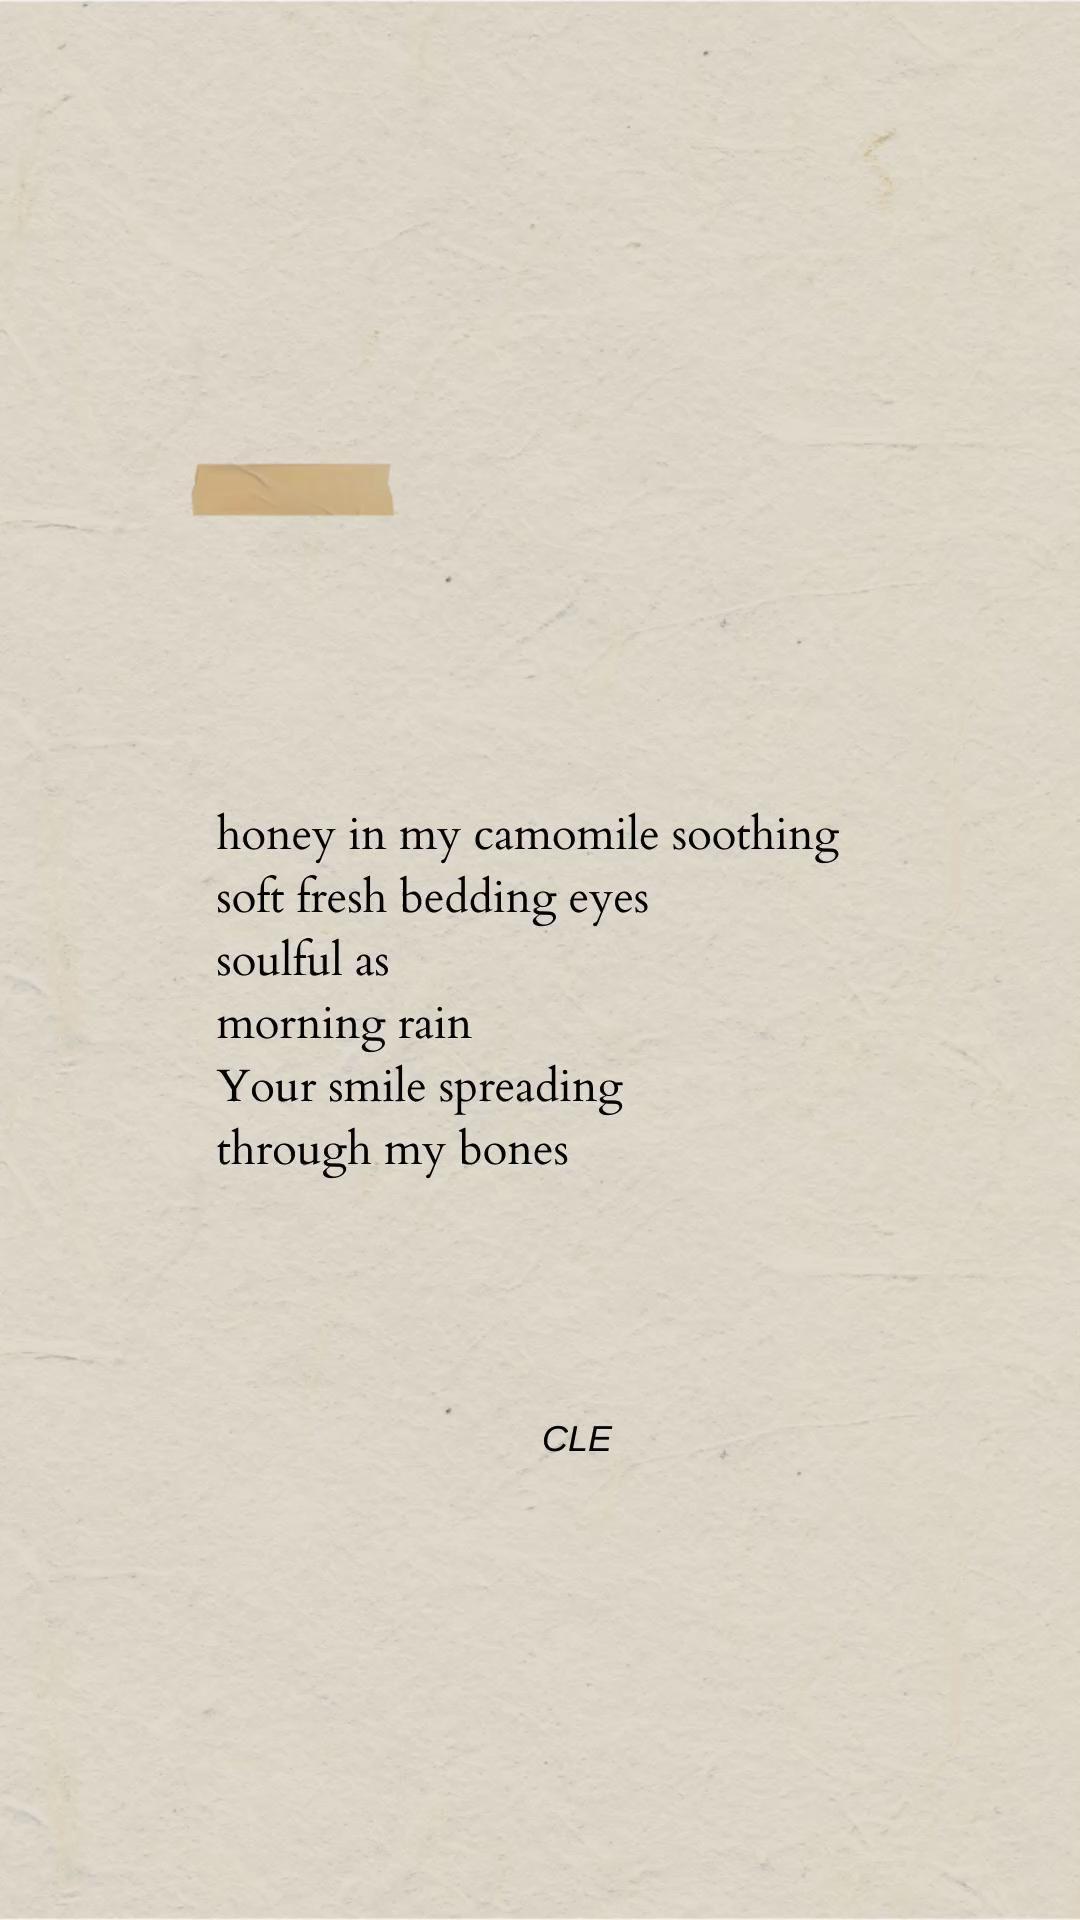 Honey in my camomile